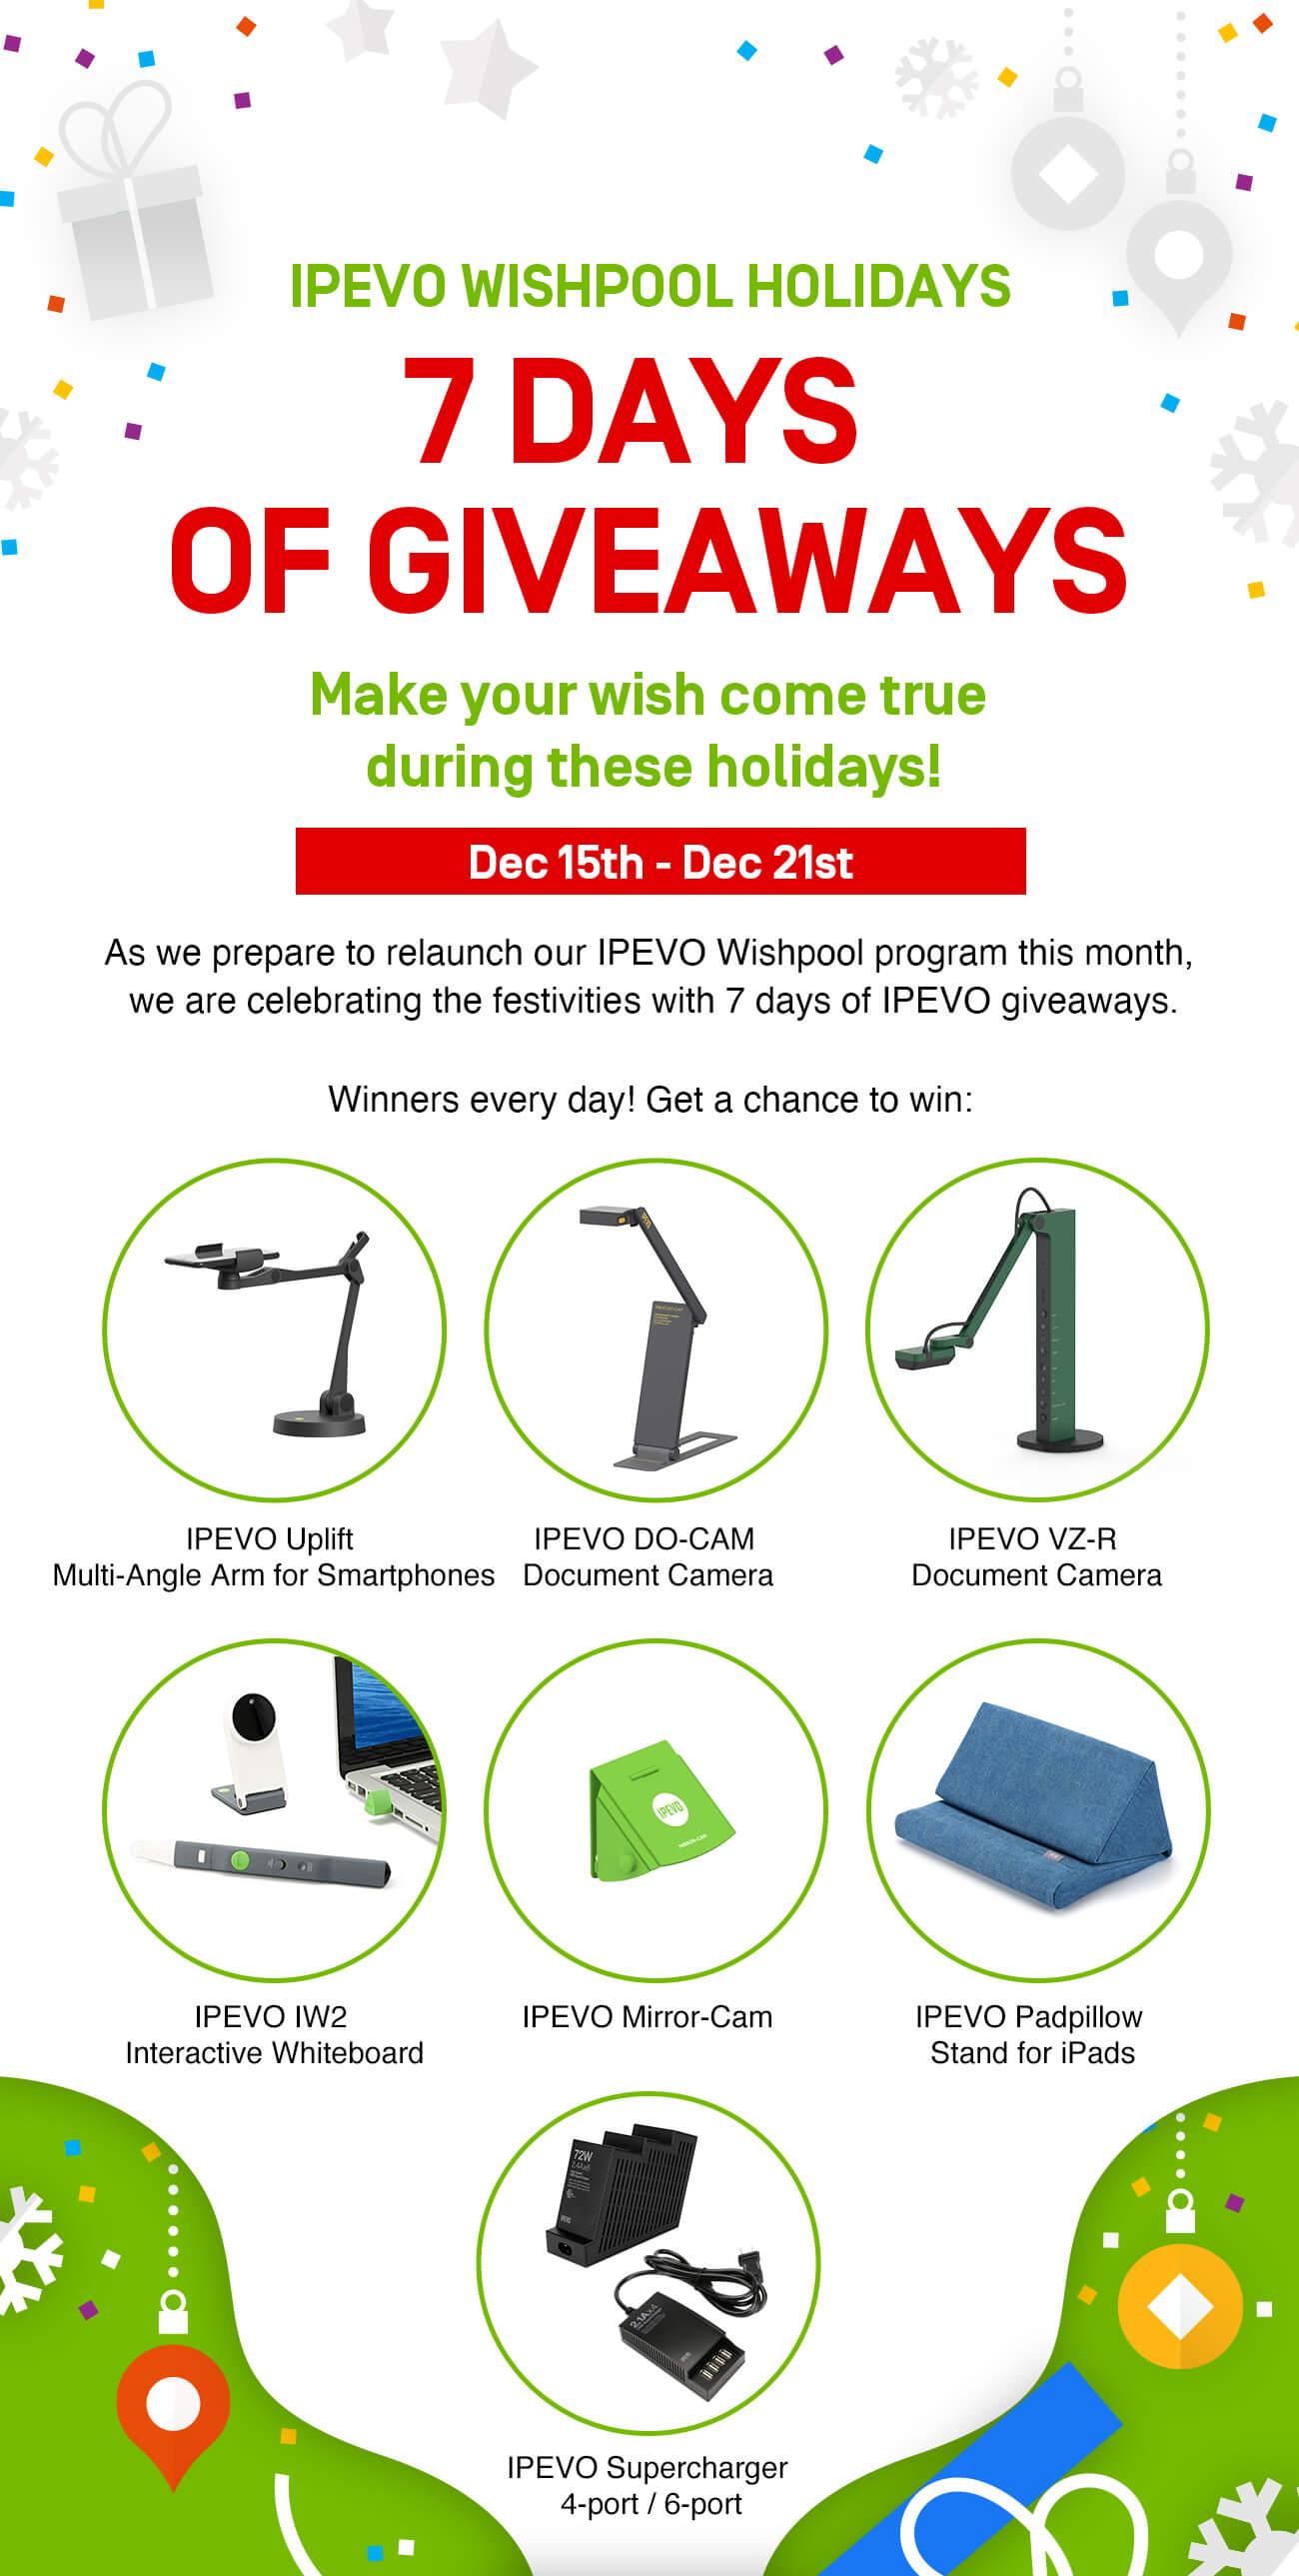 IPEVO Wishpool Holidays 7-Days of Giveaways